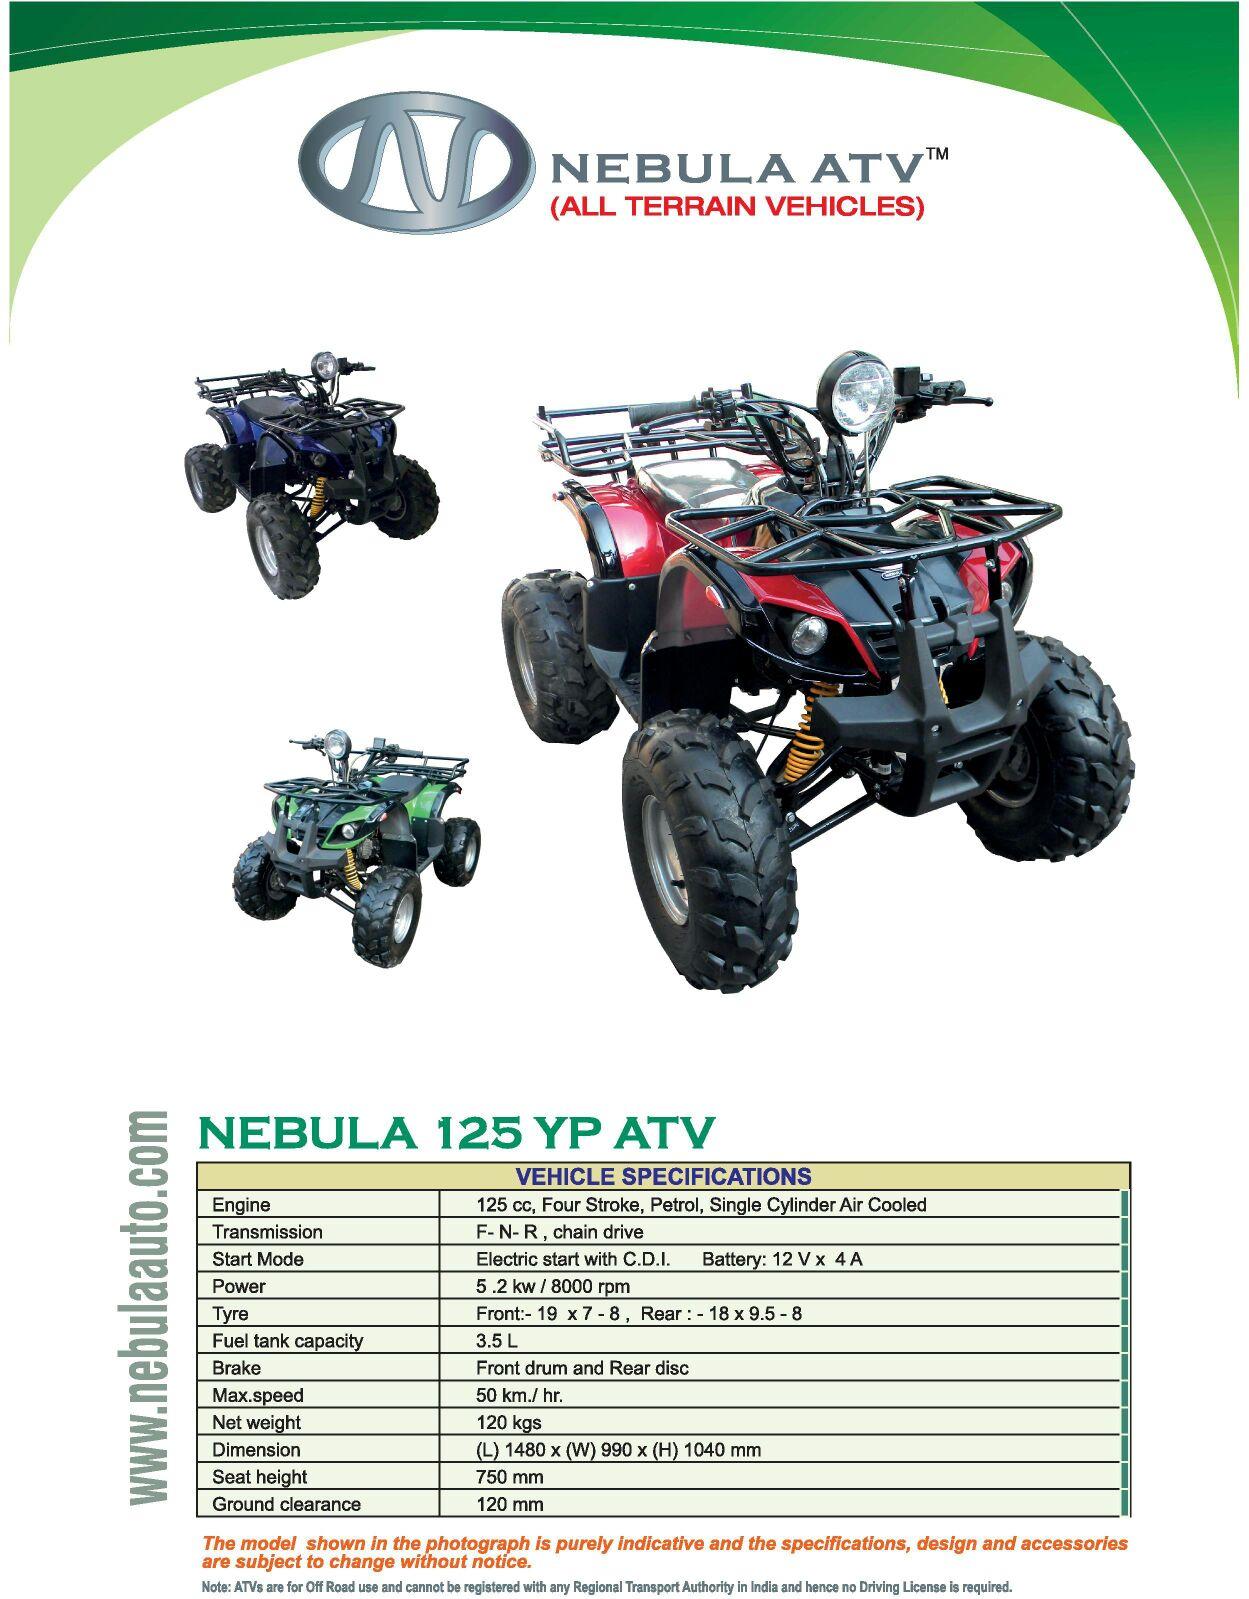 Nebula Auto best ATVs | Manufacturer of All Terrain ...